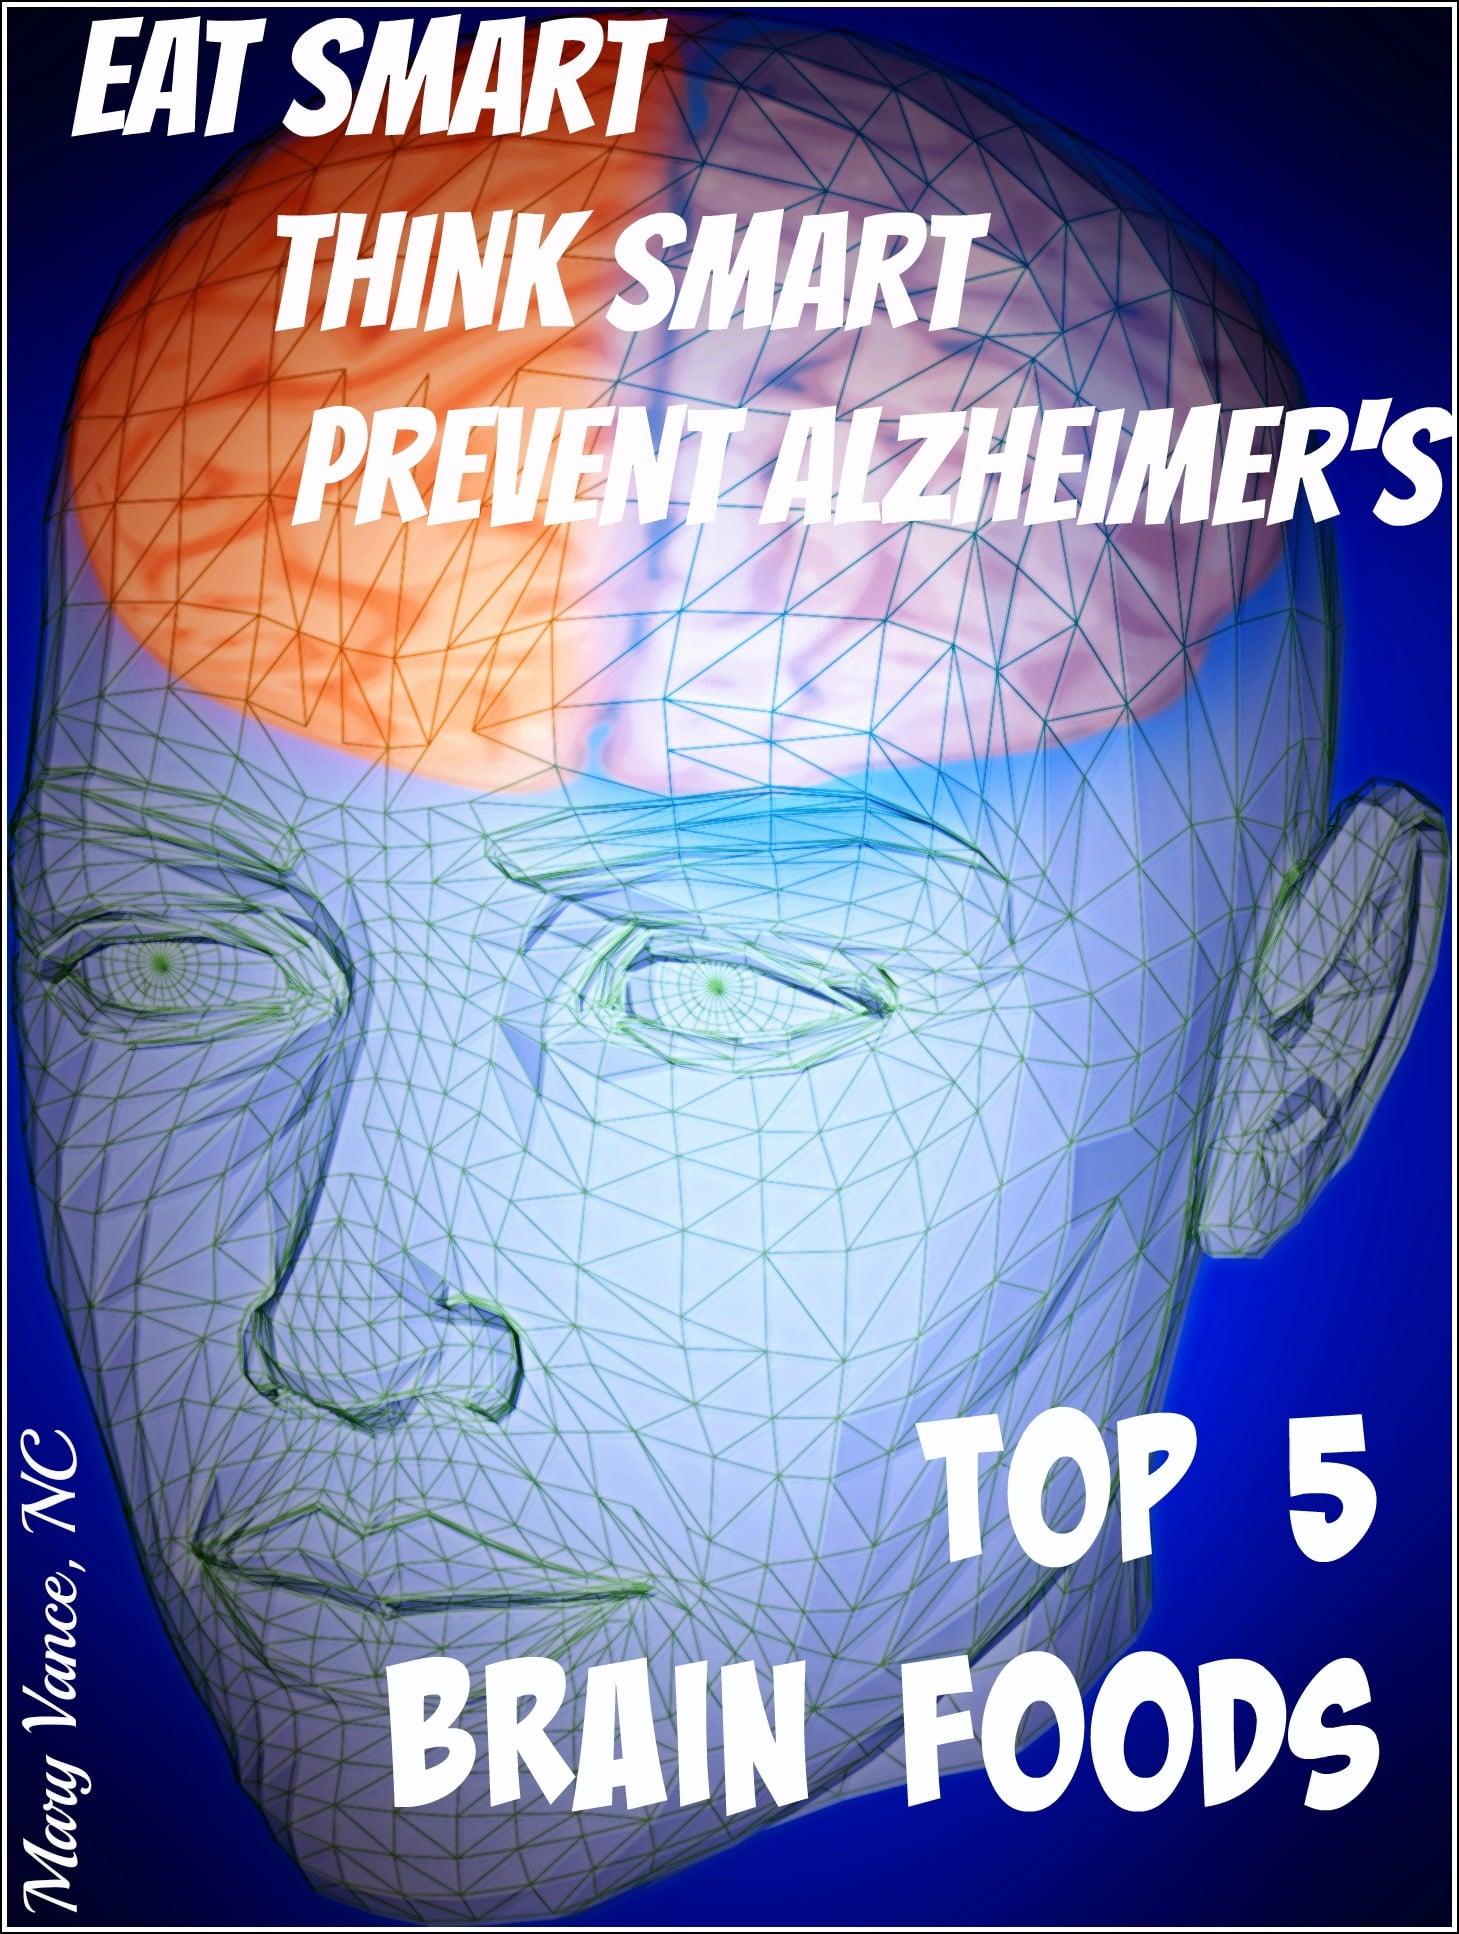 Eat Smart, Think Smart: Top 5 Brain Foods--Mary Vance, NC